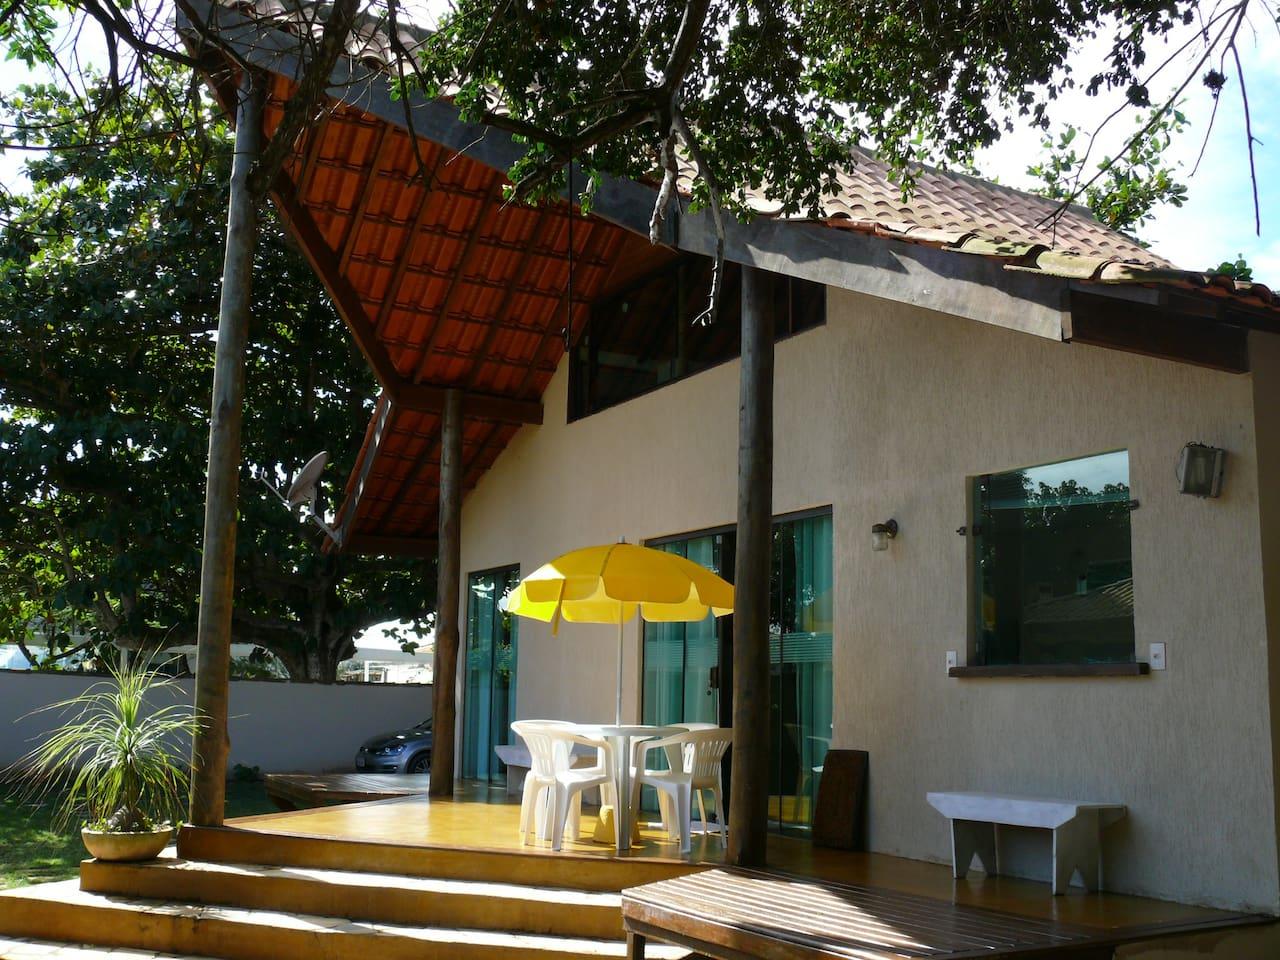 Airbnb em Búzio / Chalé na Praia Rasa